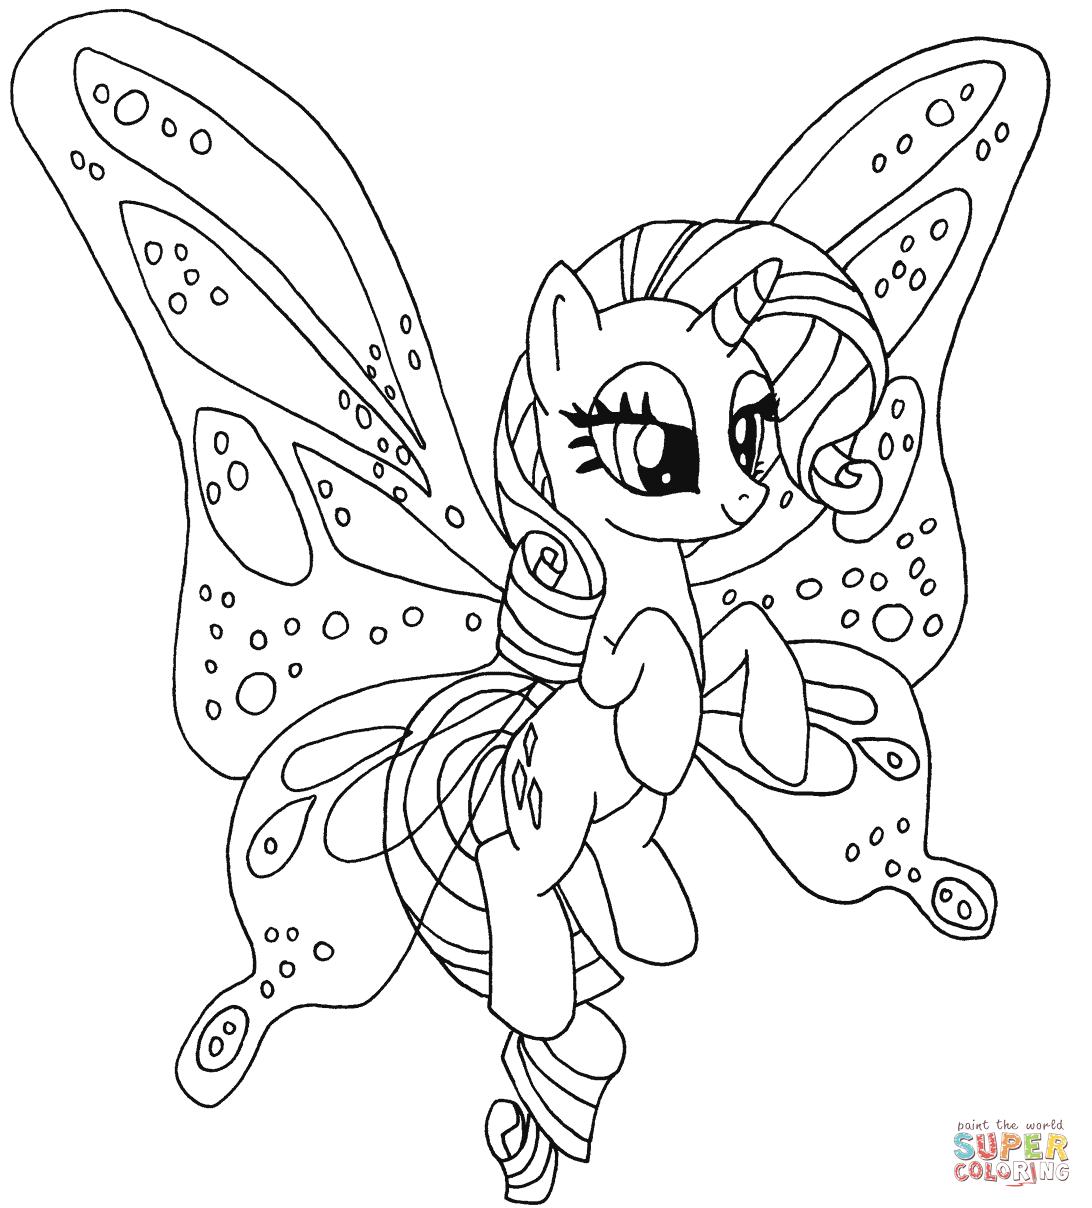 Equestria Girl Varityskuvia Google Haku My Little Pony Coloring My Little Pony Printable My Little Pony Rarity